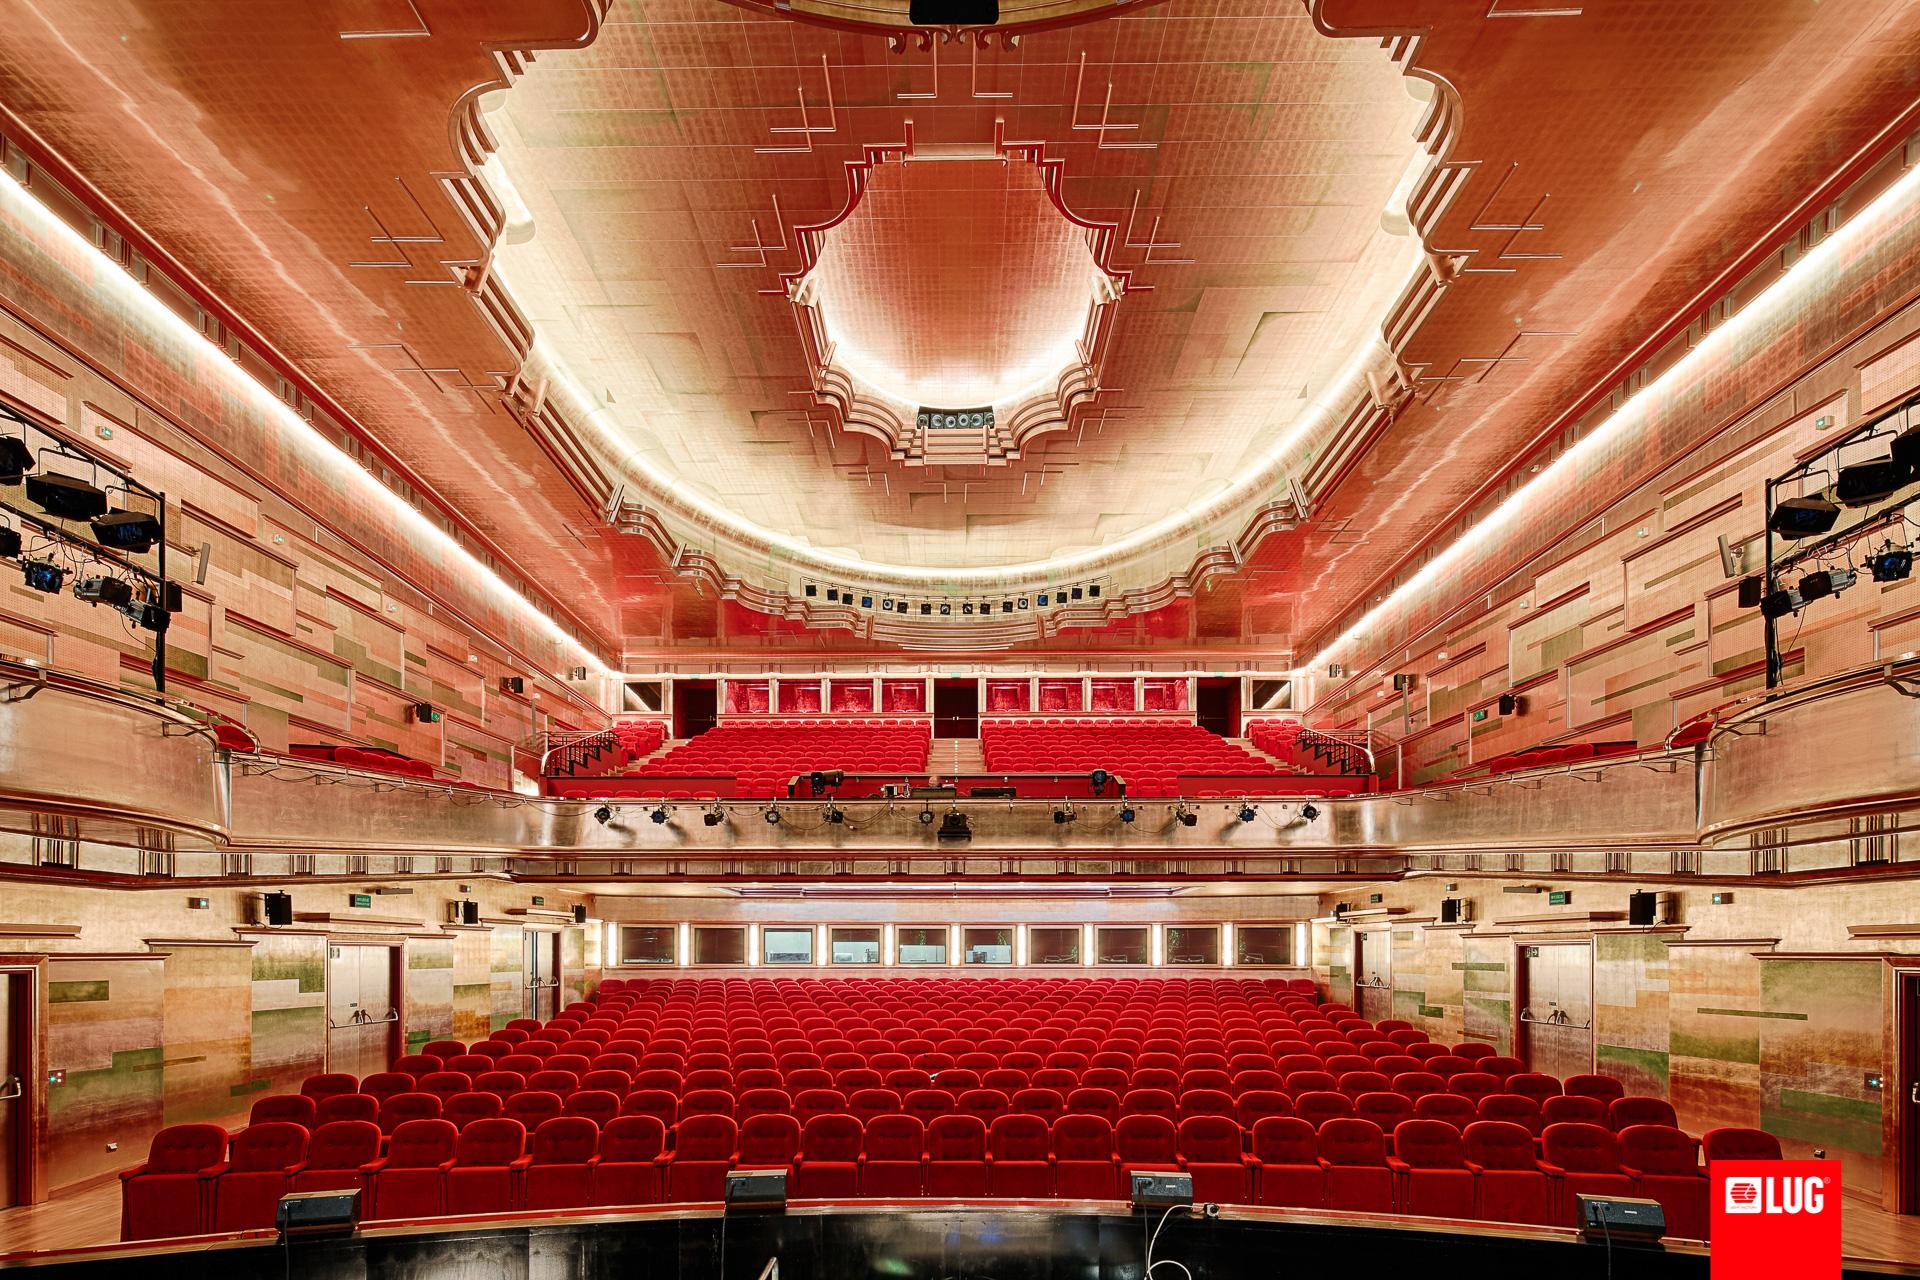 Capitol Musical Theatre Wrocław Poland Lug